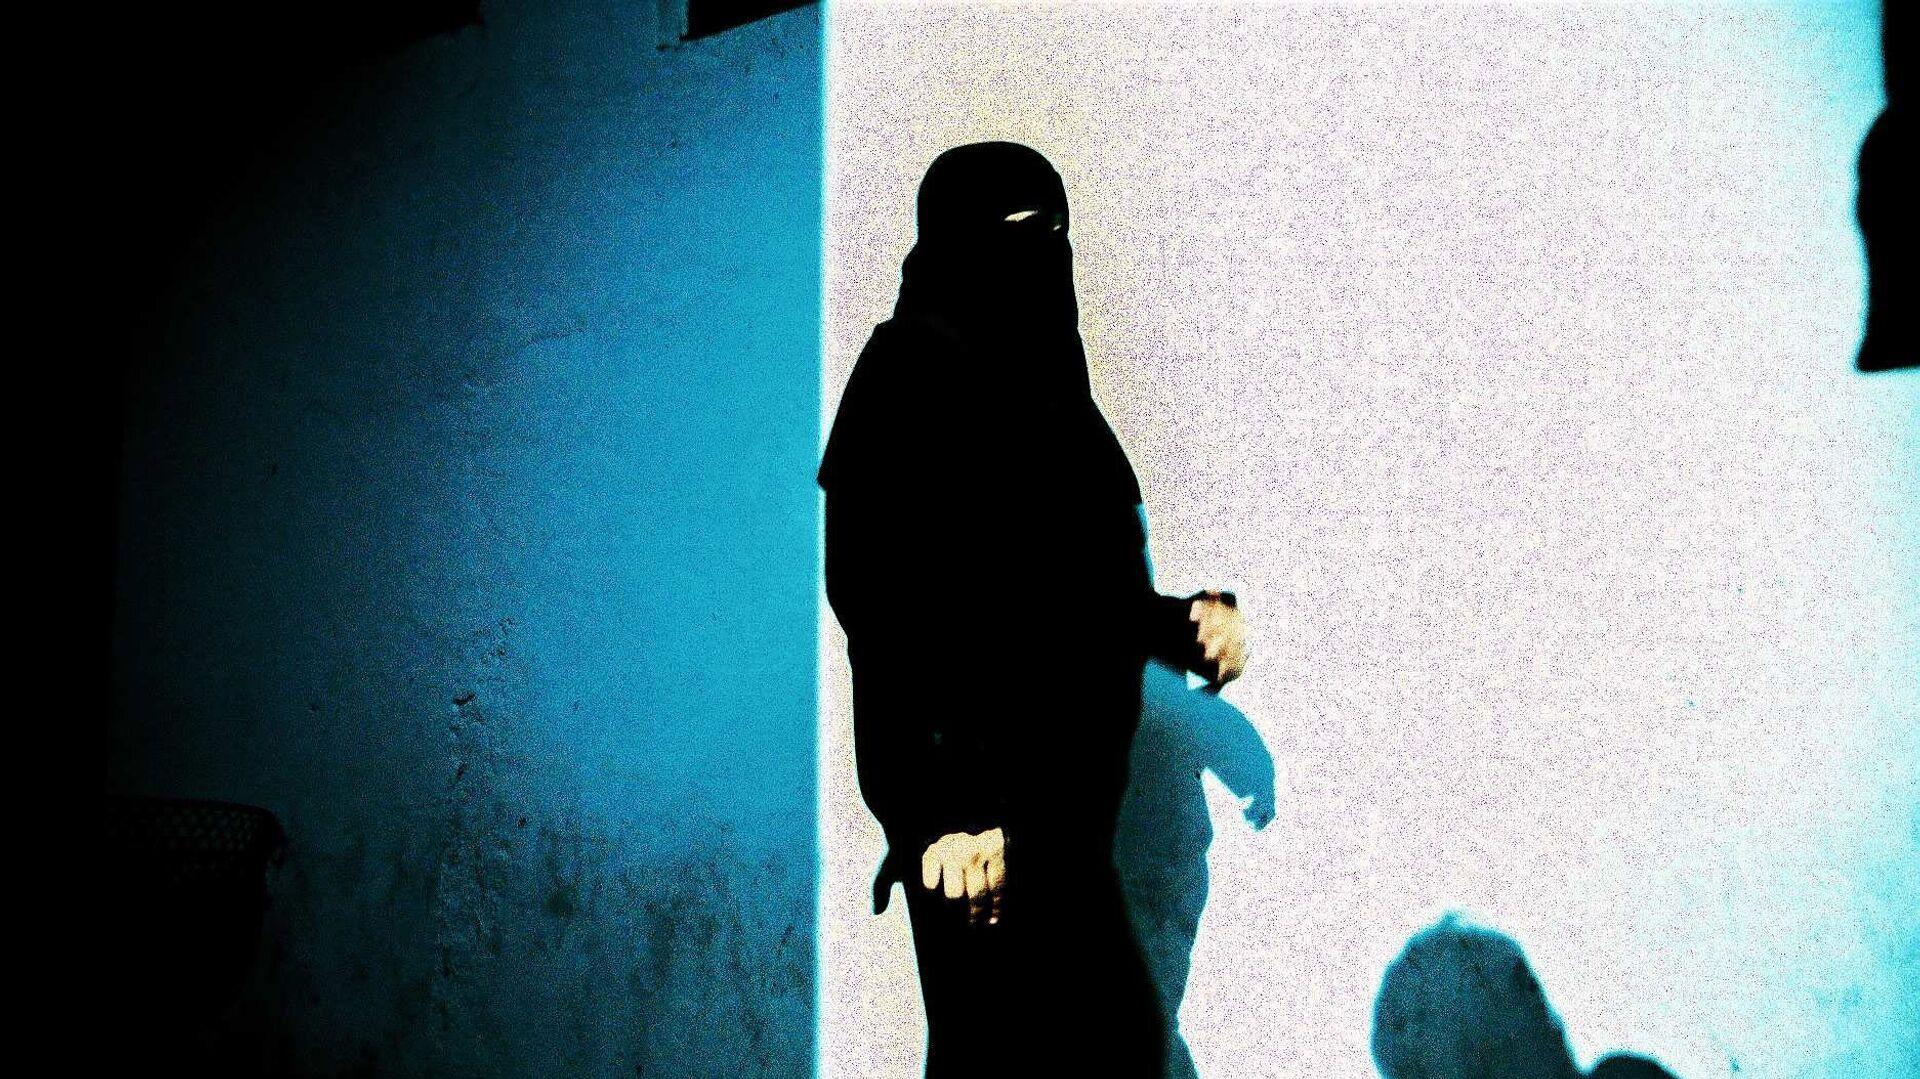 Una donna musulmana - Sputnik Italia, 1920, 21.05.2021